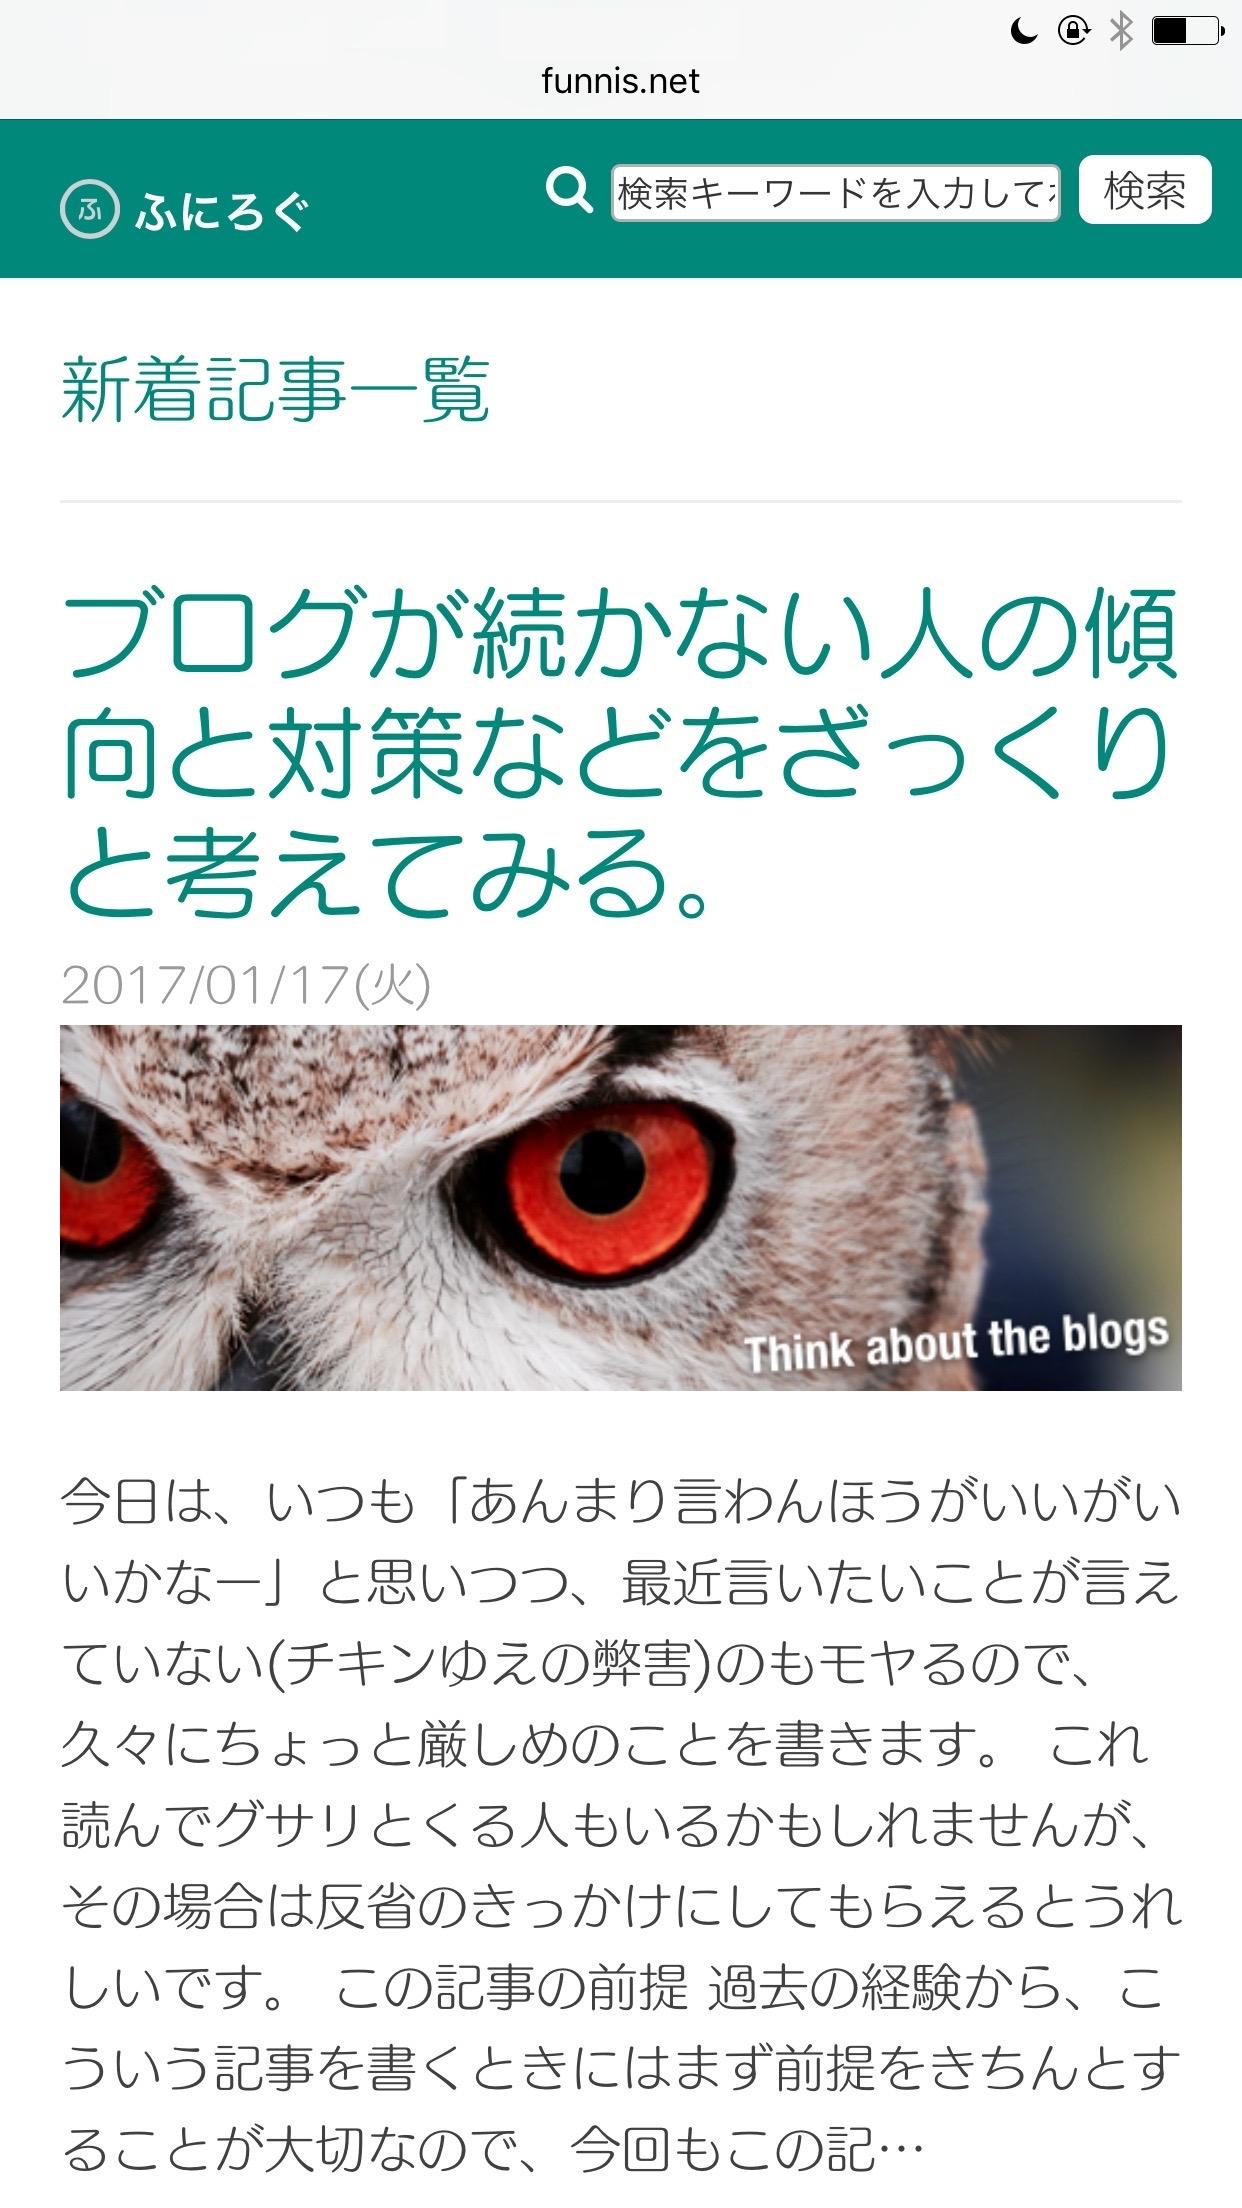 https://news.mynavi.jp/itsearch/2017/05/09/blog01.jpg